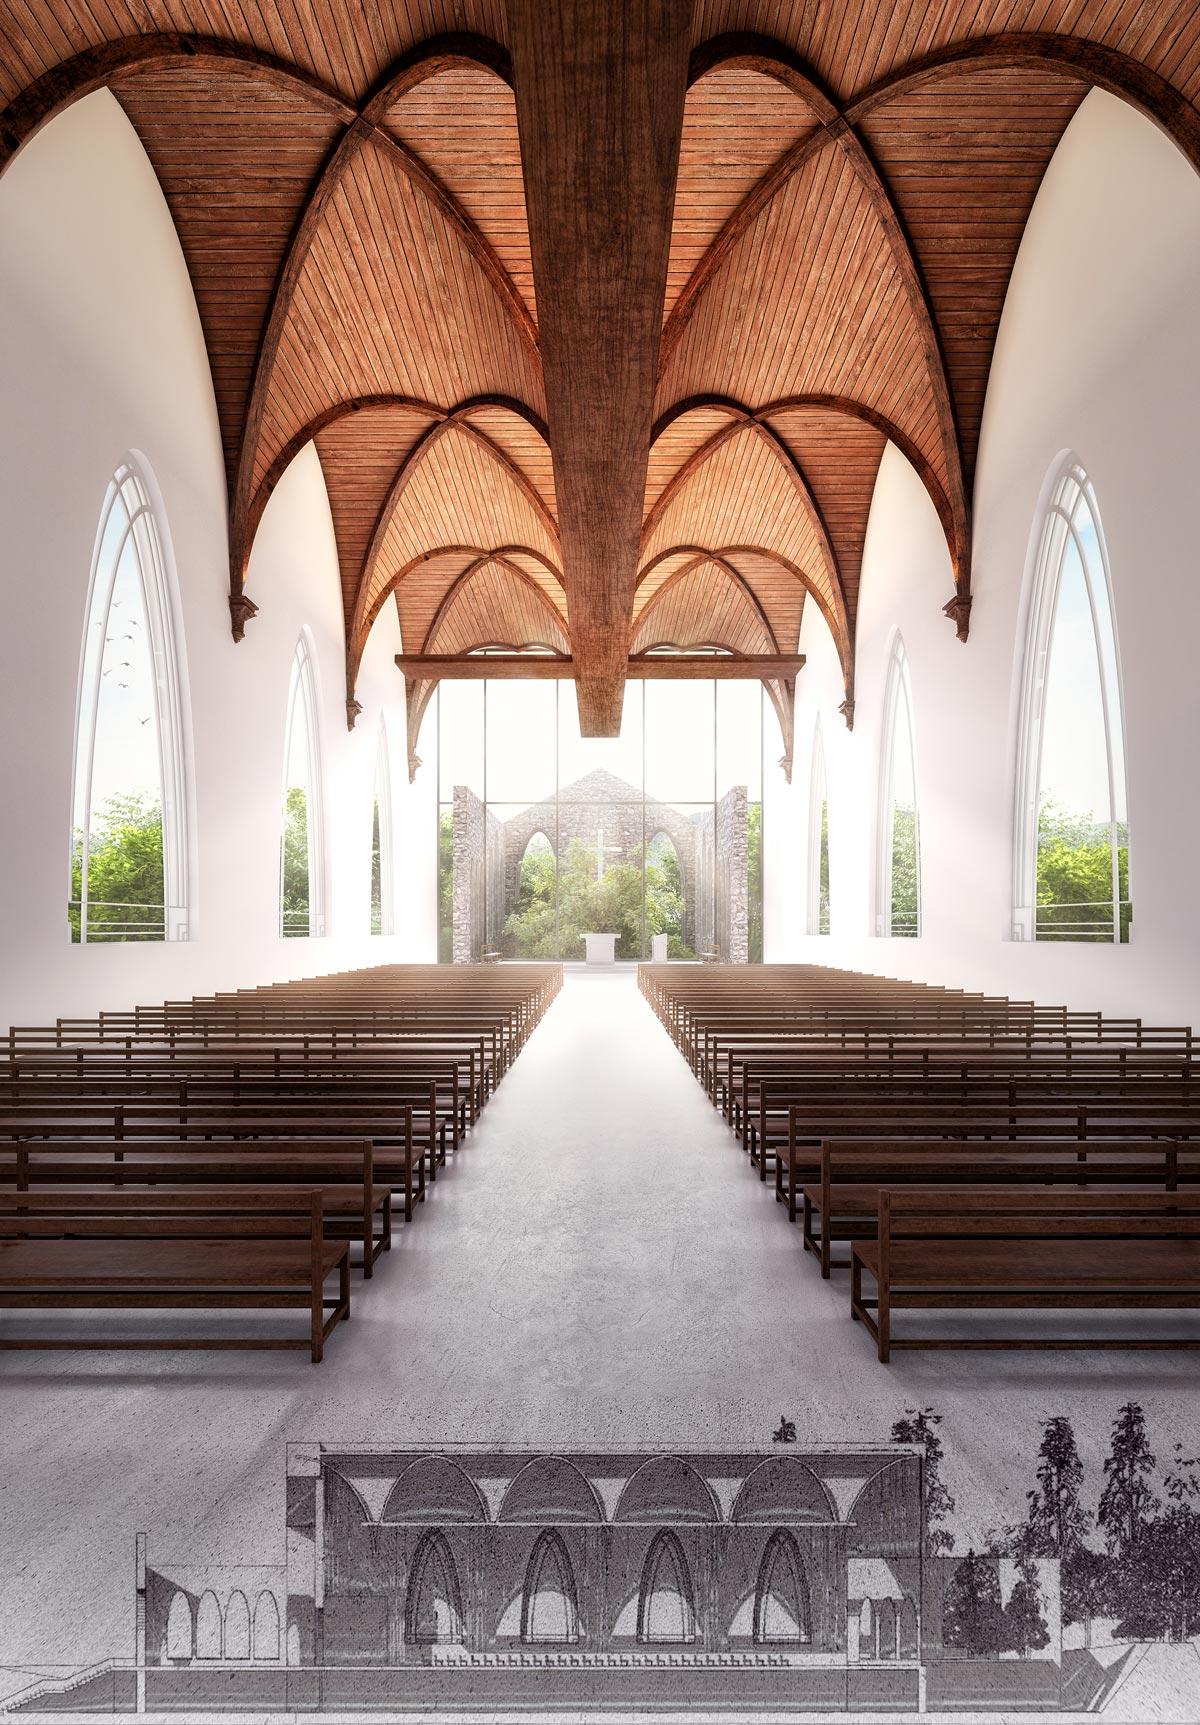 church-of-freeport-bahamas-4.jpg